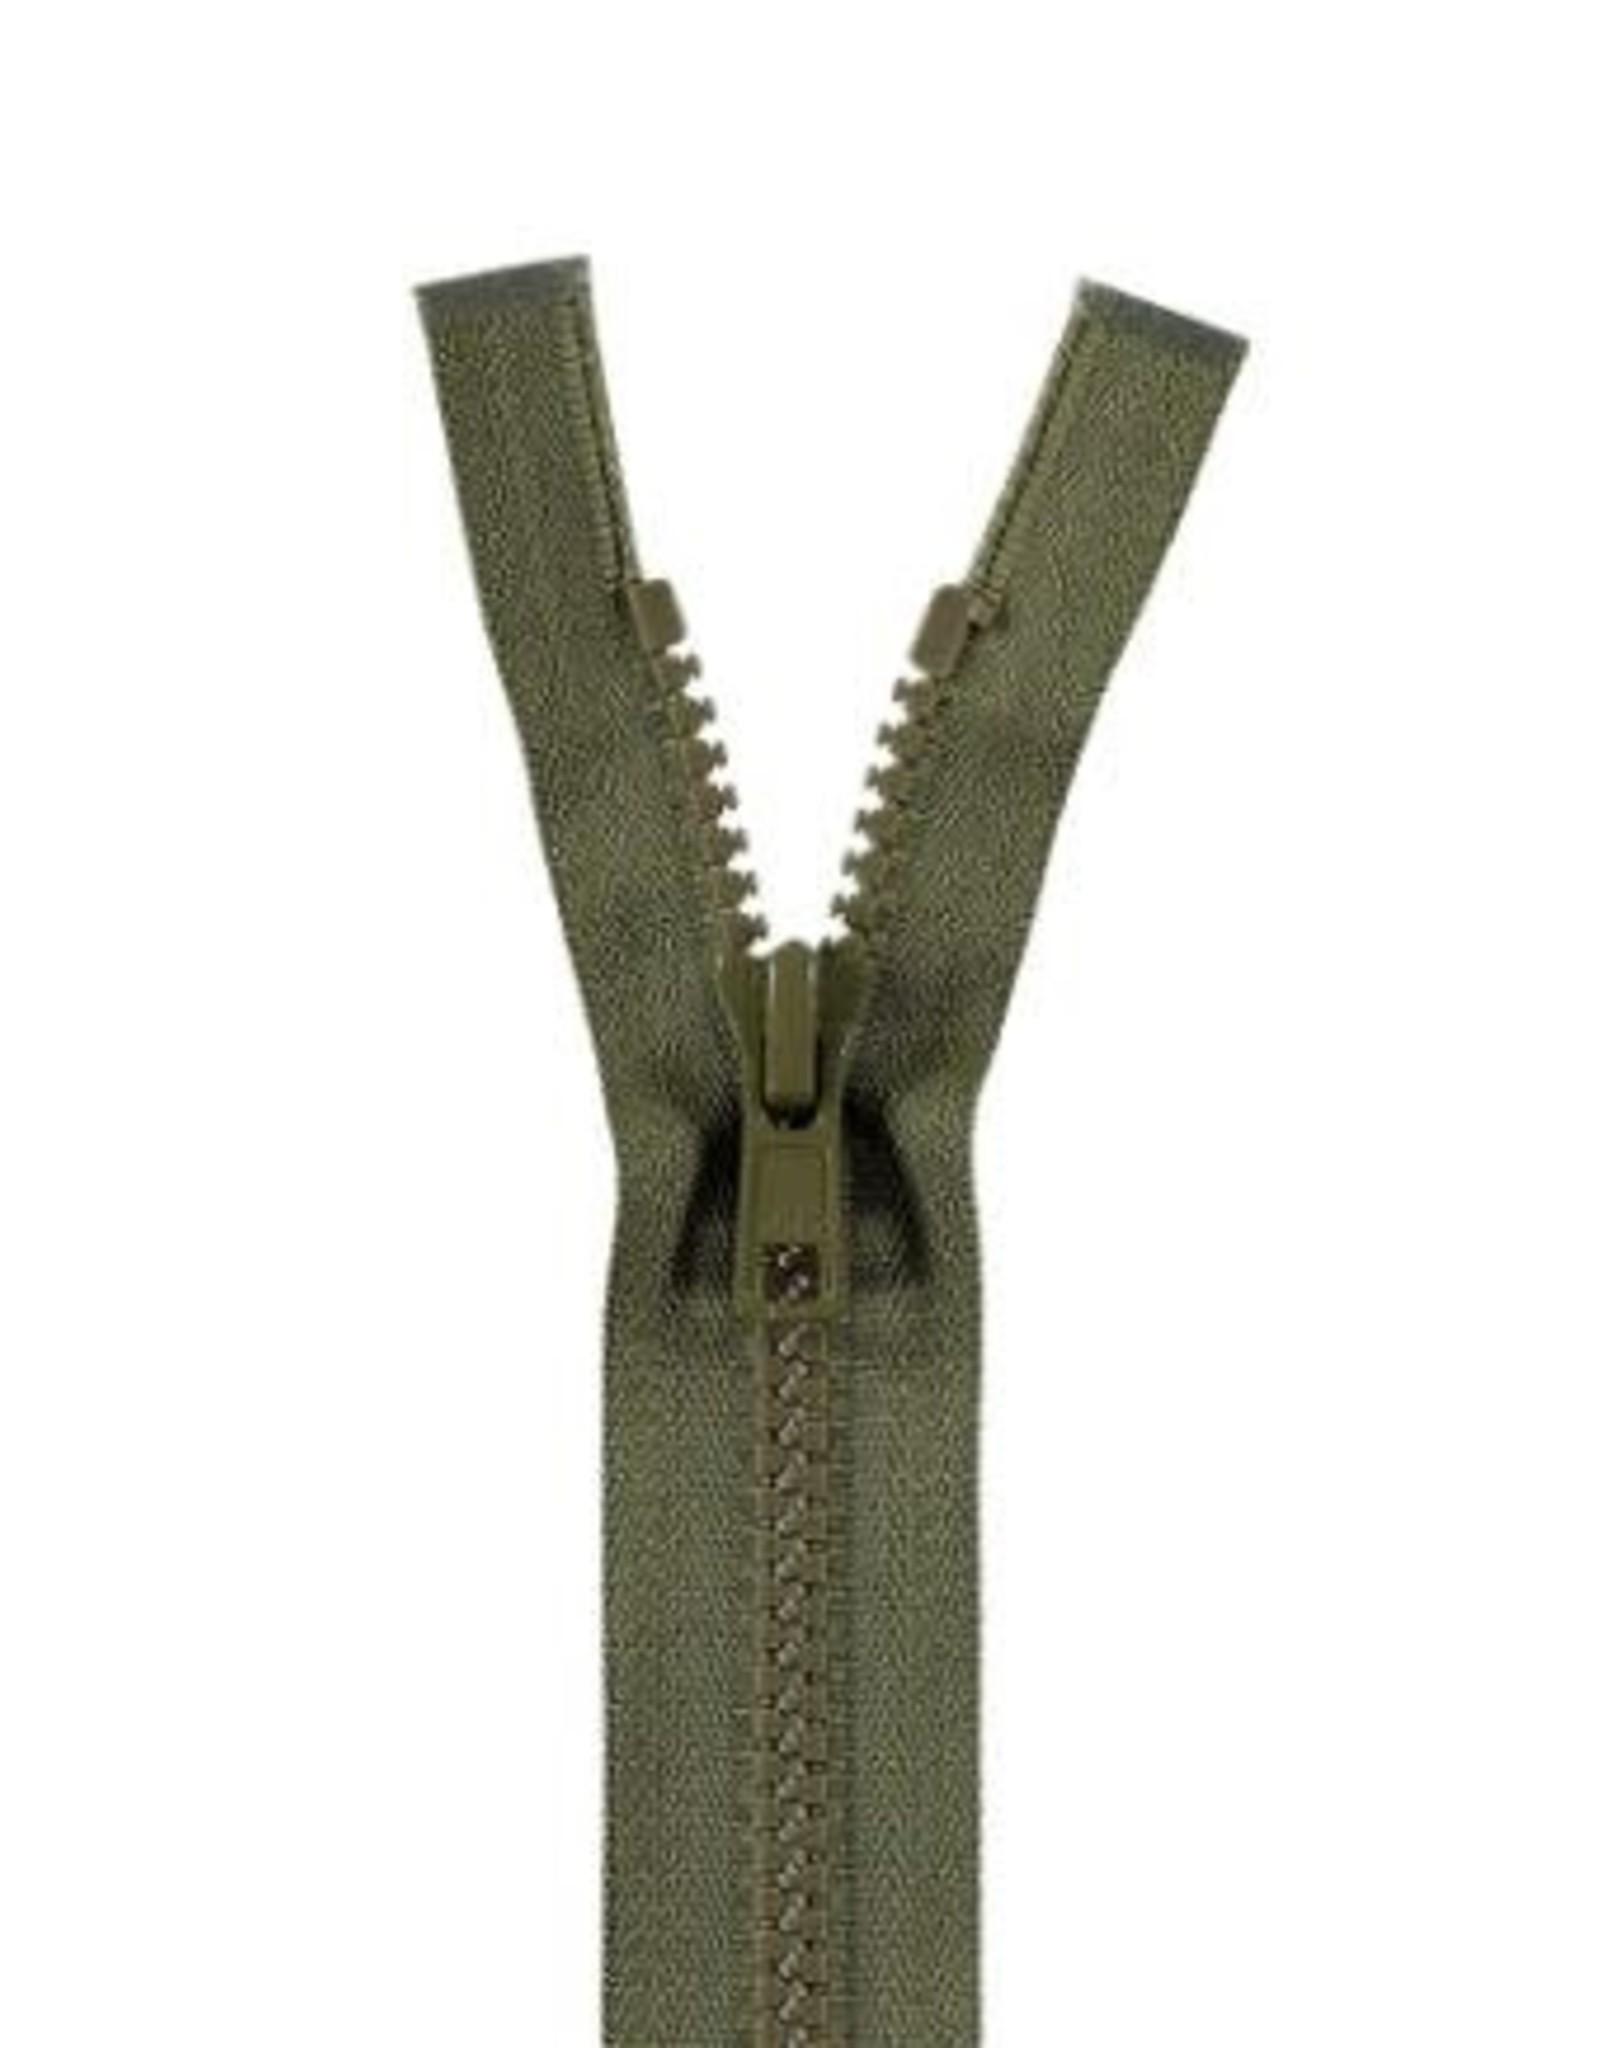 YKK BLOKRITS 5 DEELBAAR legergroen 566-65cm